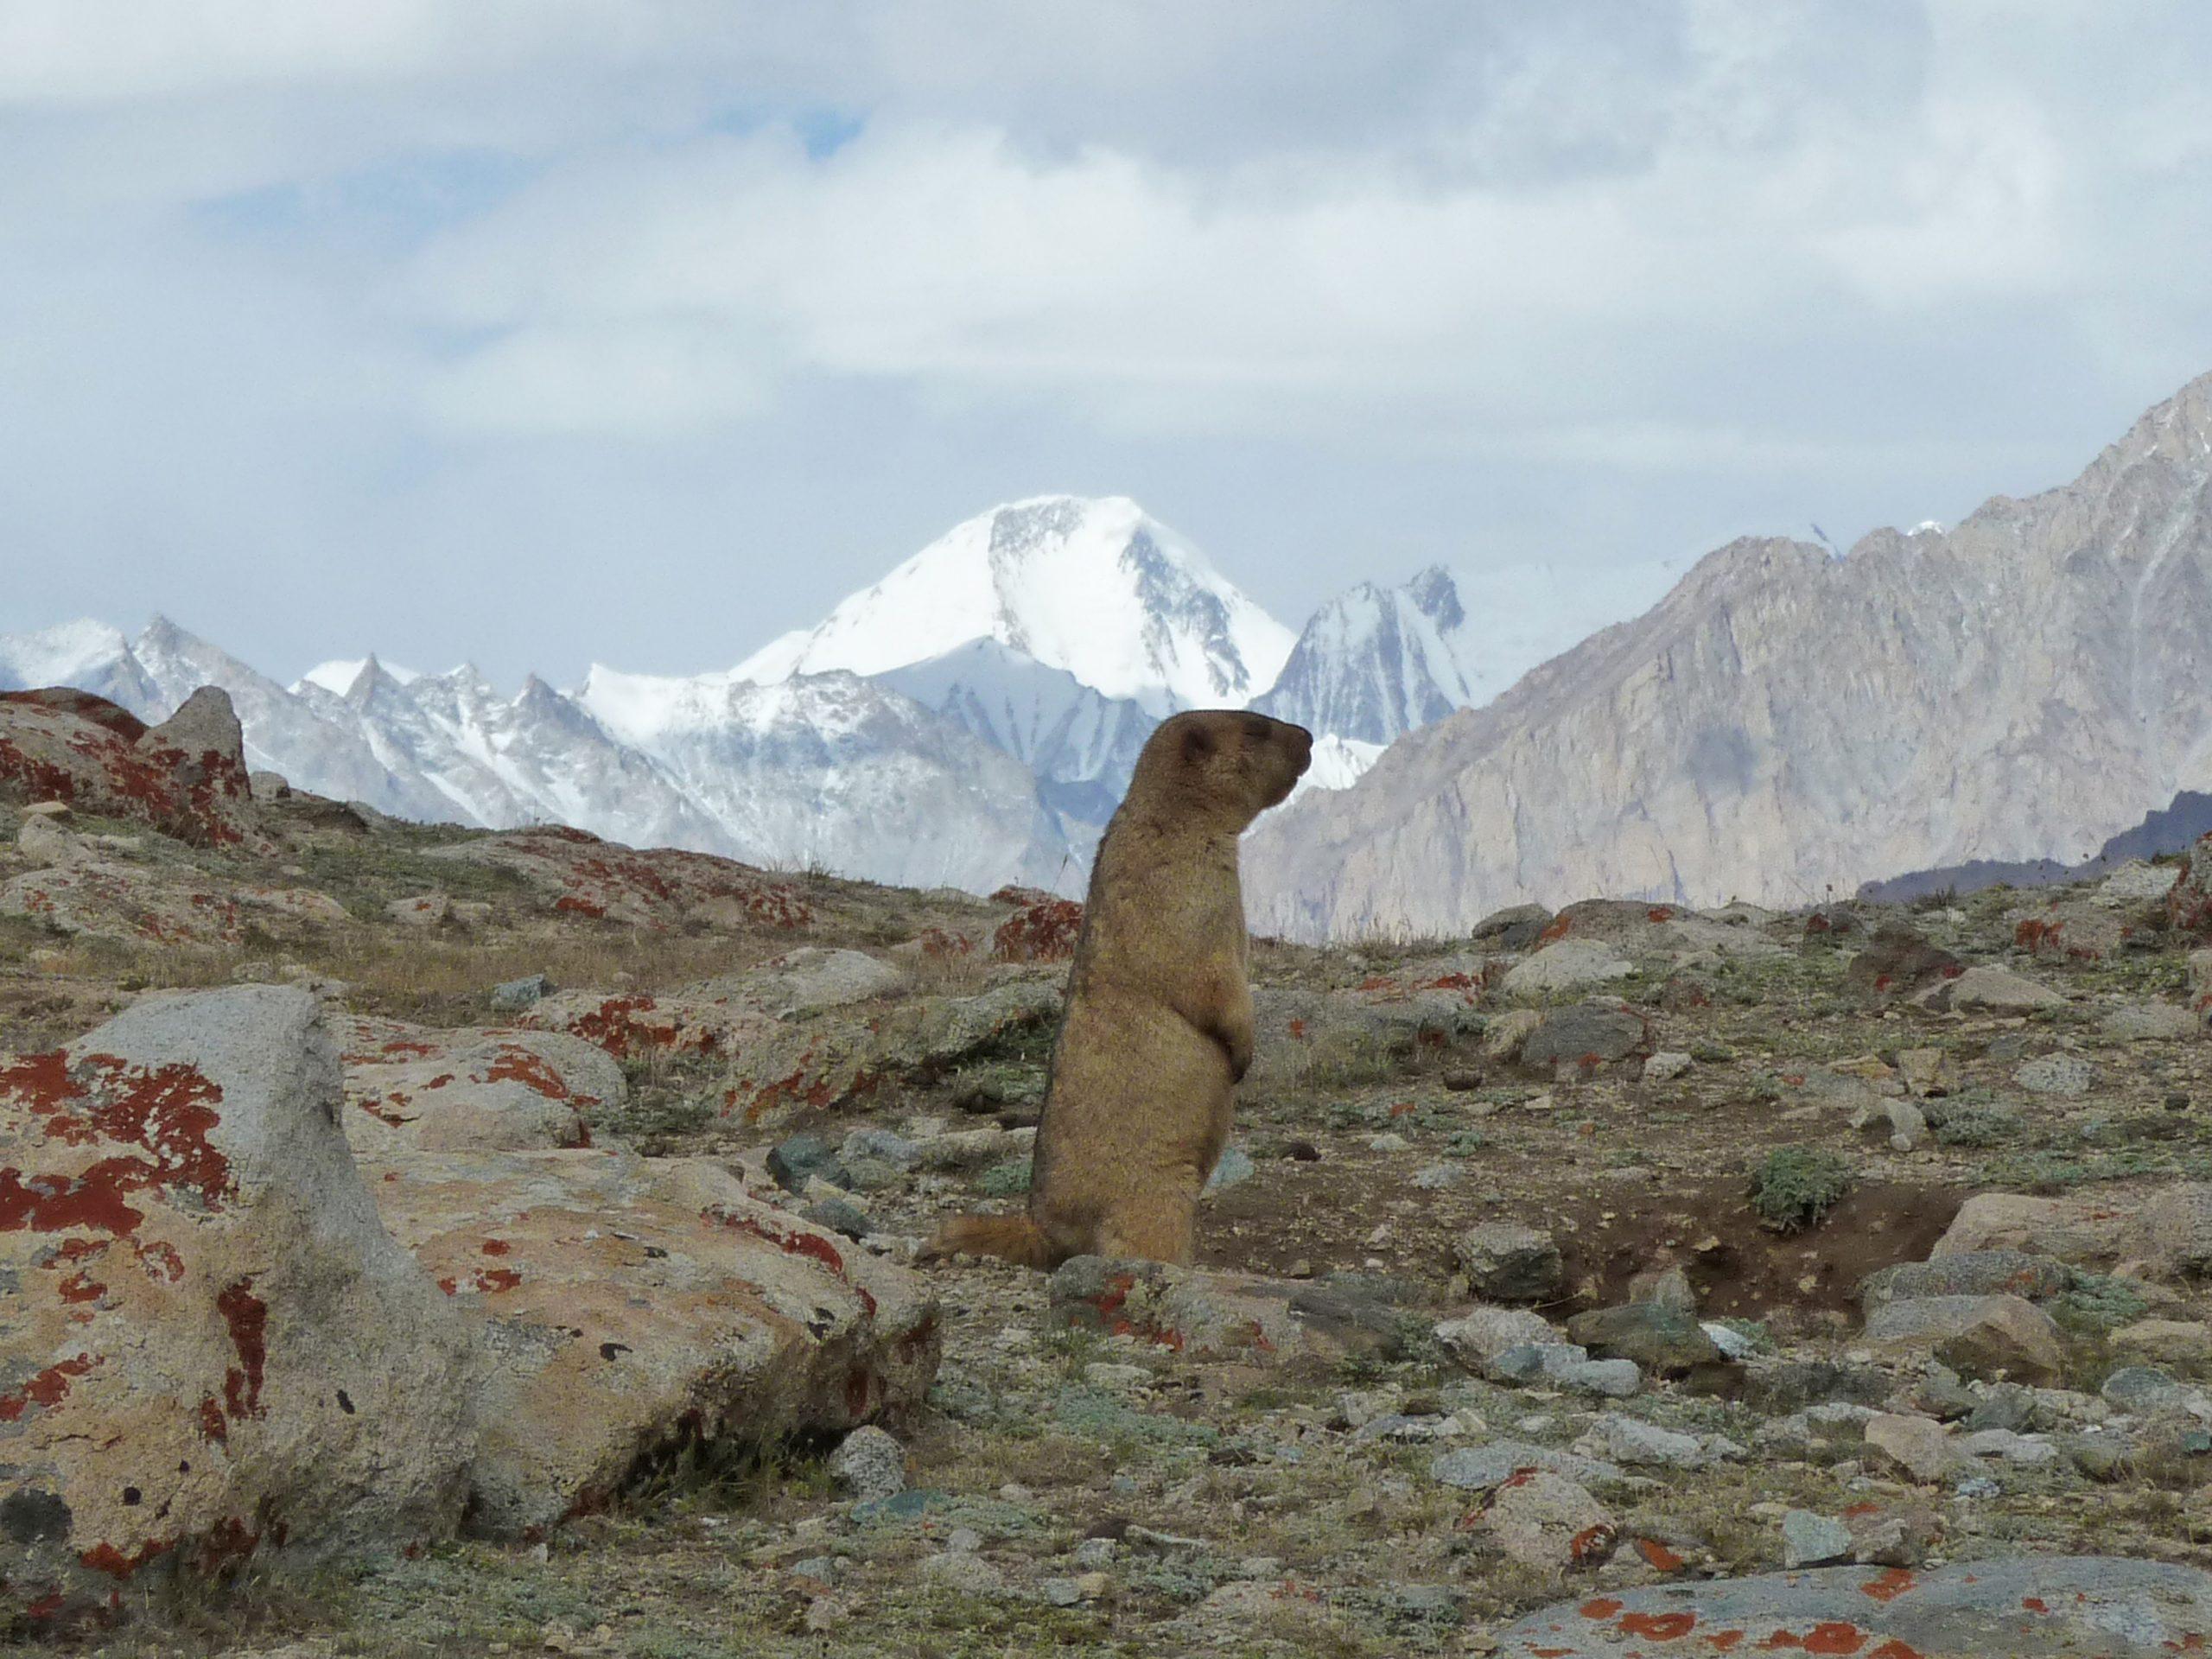 Radreise Ladakh 2012 - Murmeltier am Tsolding Buddha Park